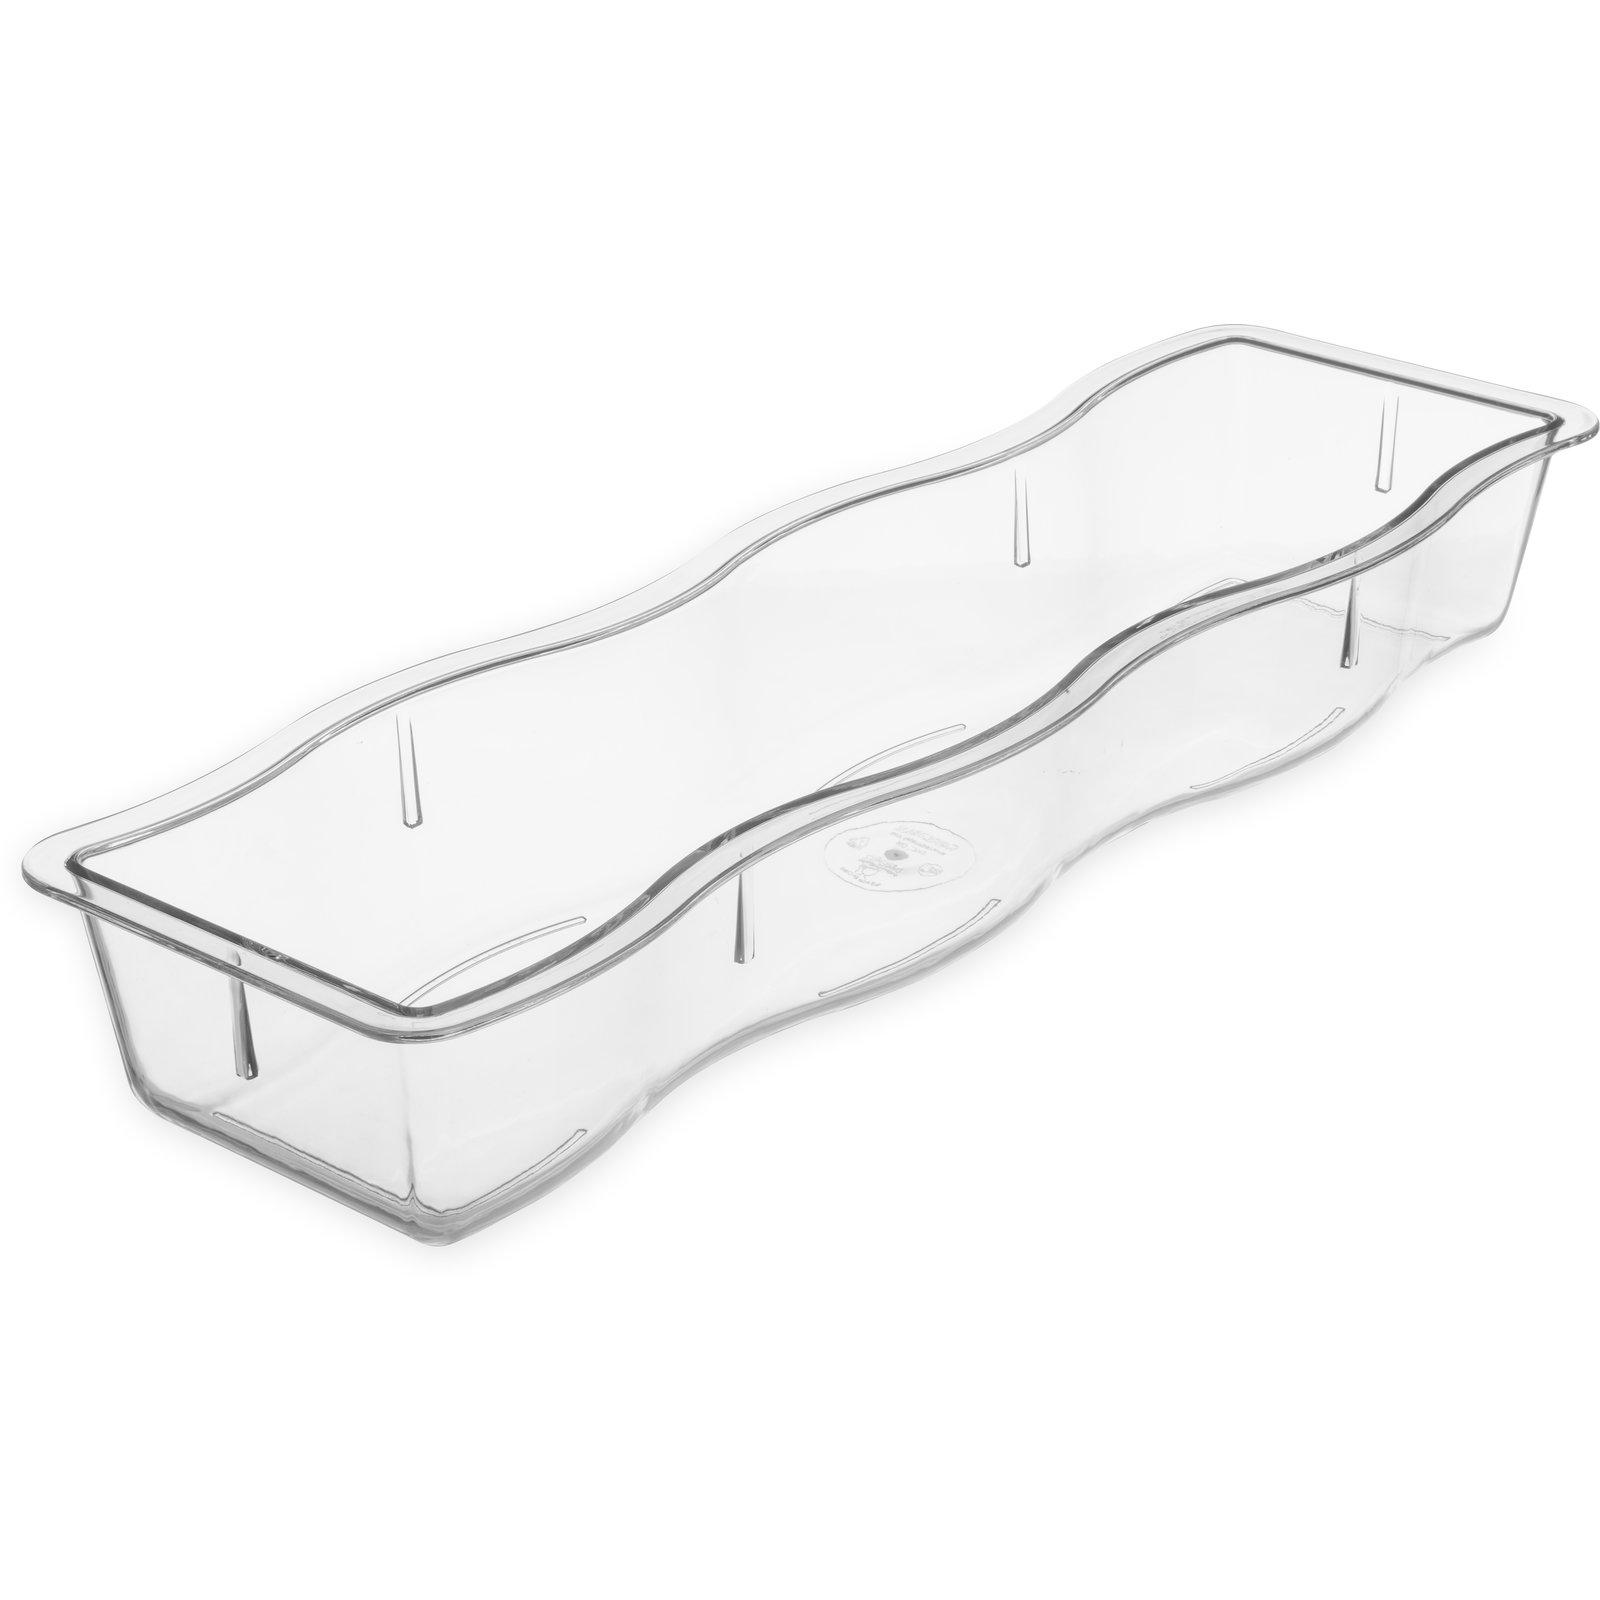 698207 Modular Displayware Half Long Pan Wavy Edge 2 1 2 Deep Clear Carlisle Foodservice Products